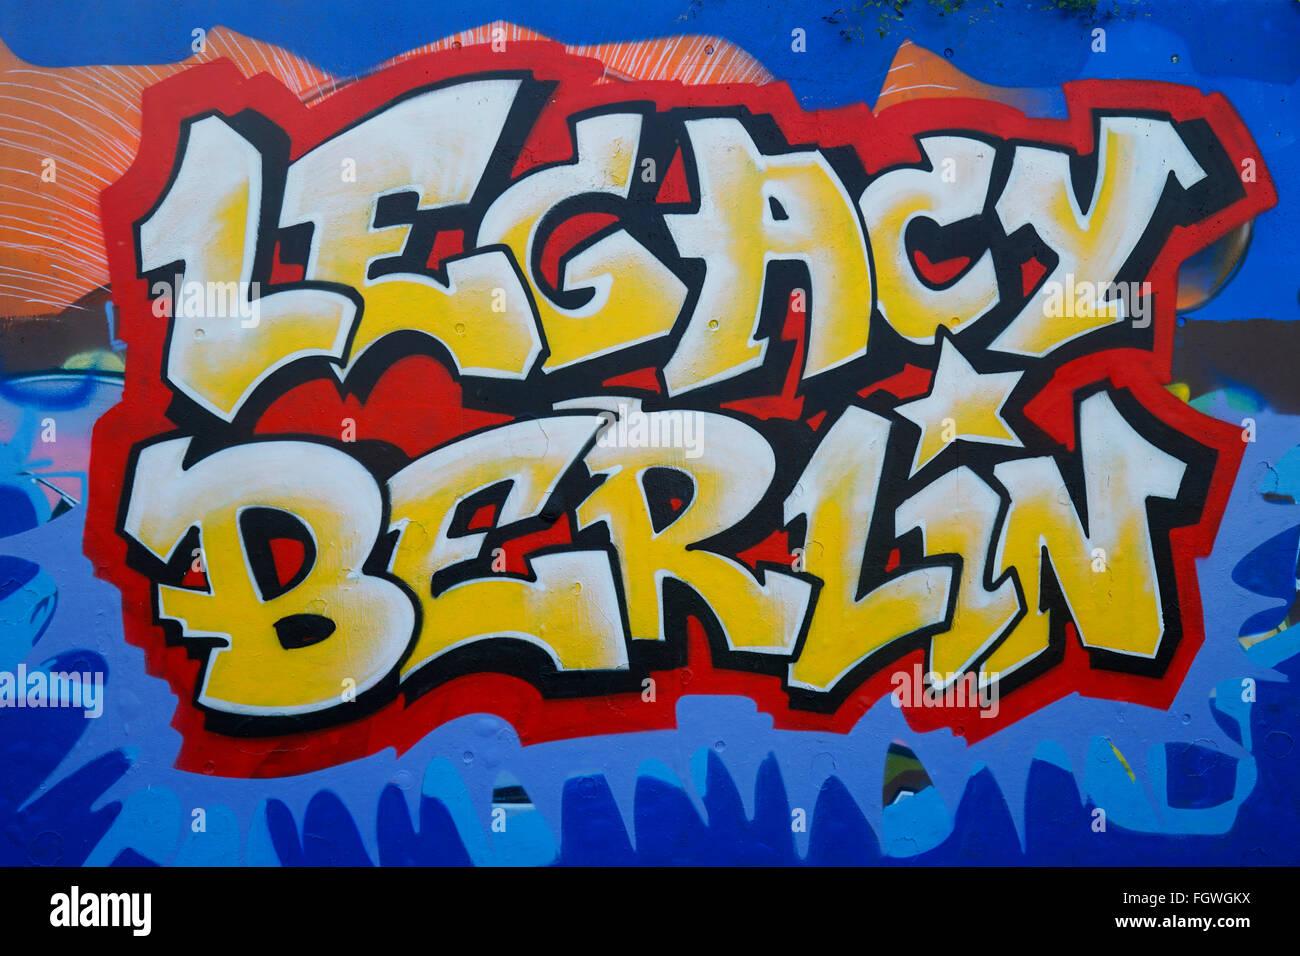 GER, Berlin, 20150830, Gleisdreieck, Parkanlage in Berlin, Graffittie, legacy berlin - Stock Image